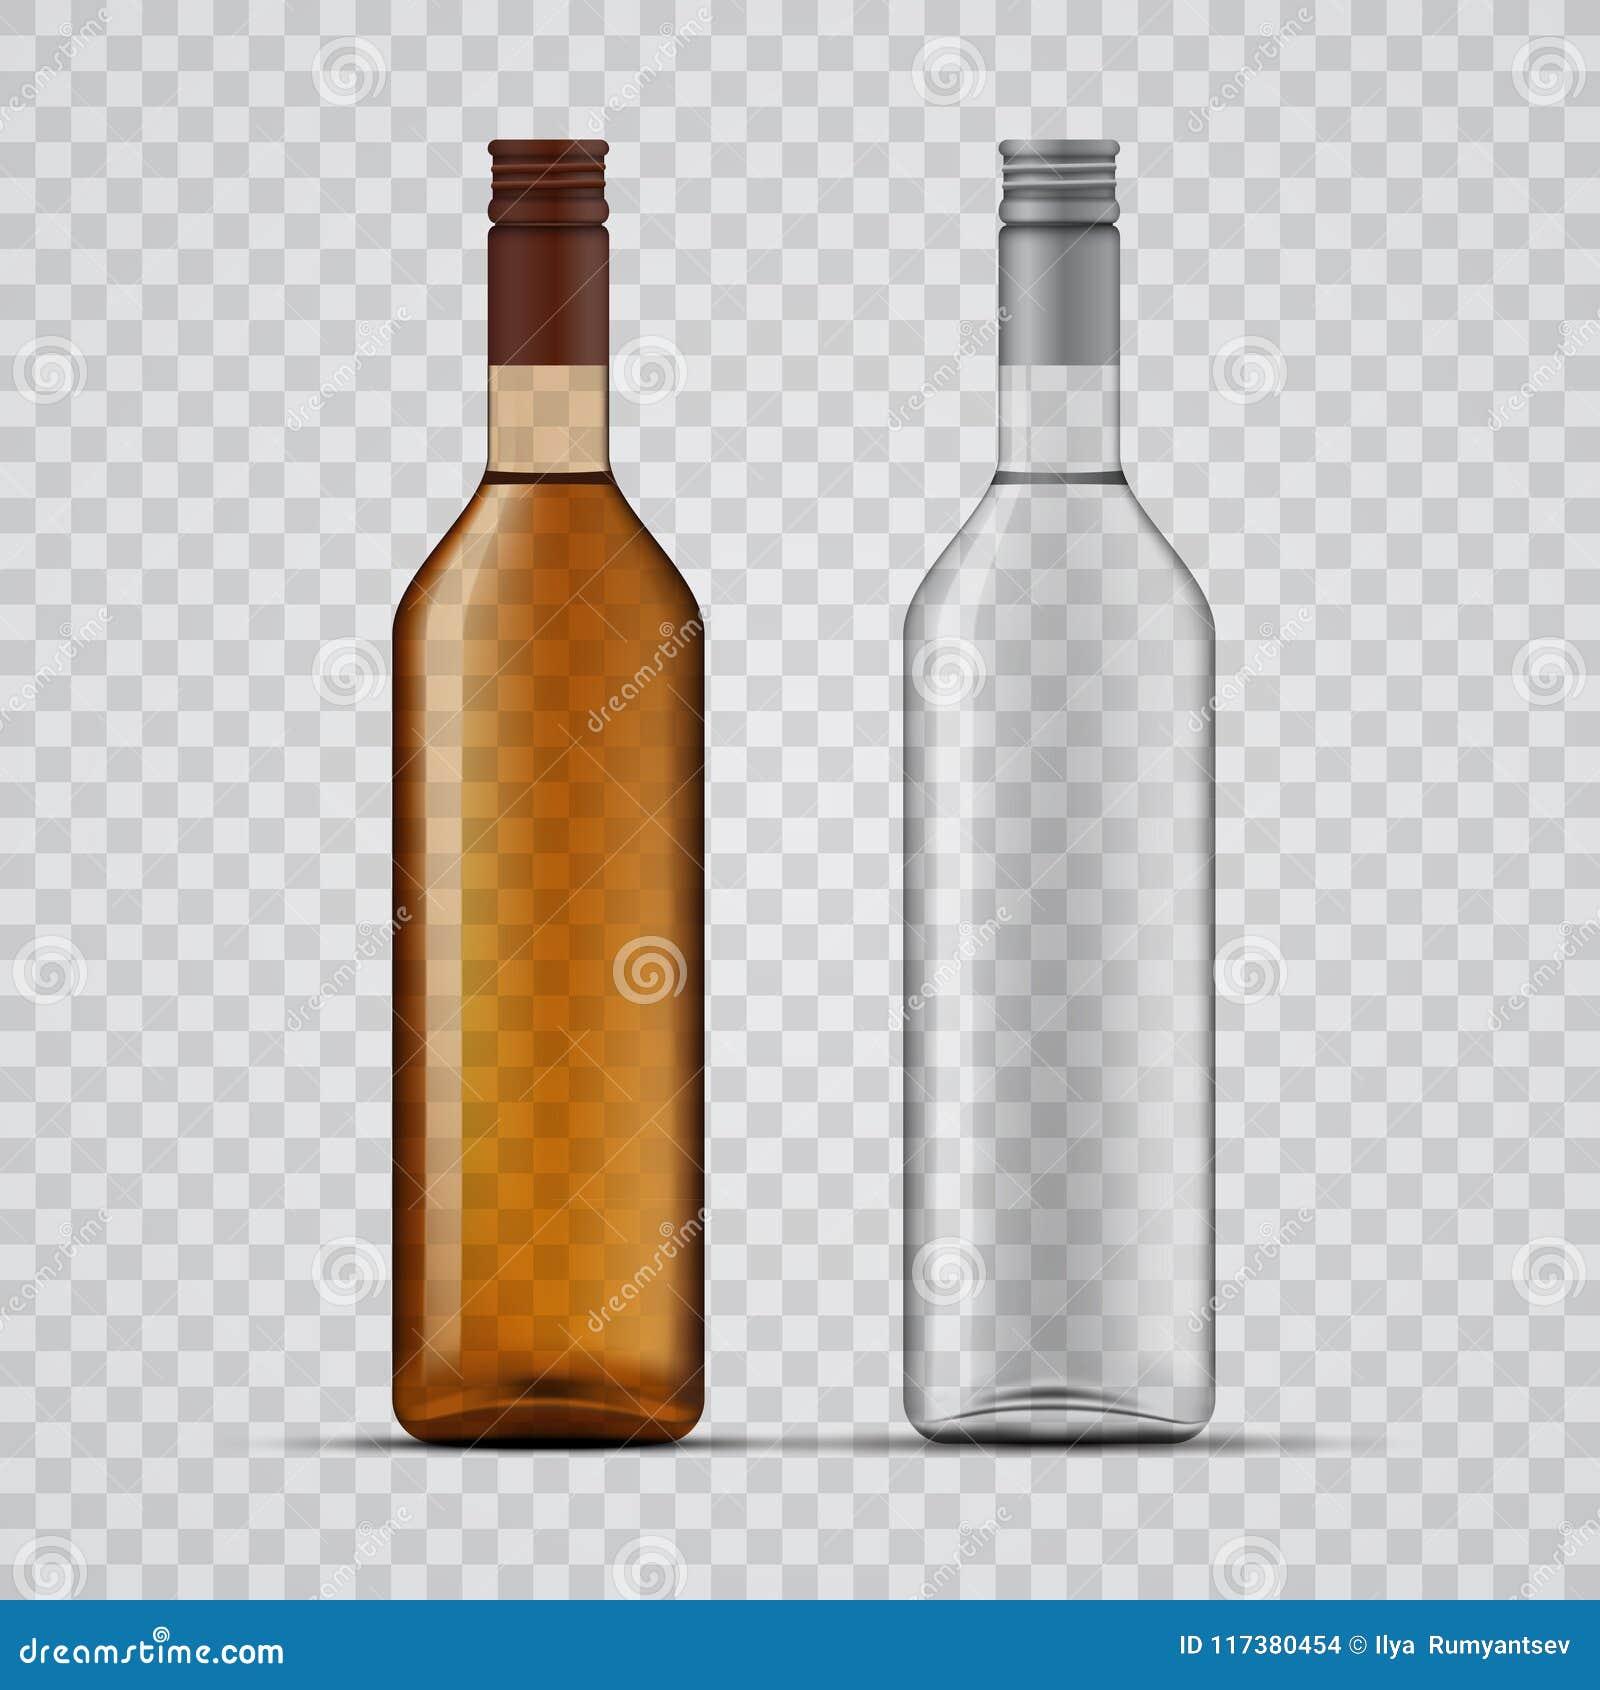 whiskey and vodka transparent bottles design stock vector